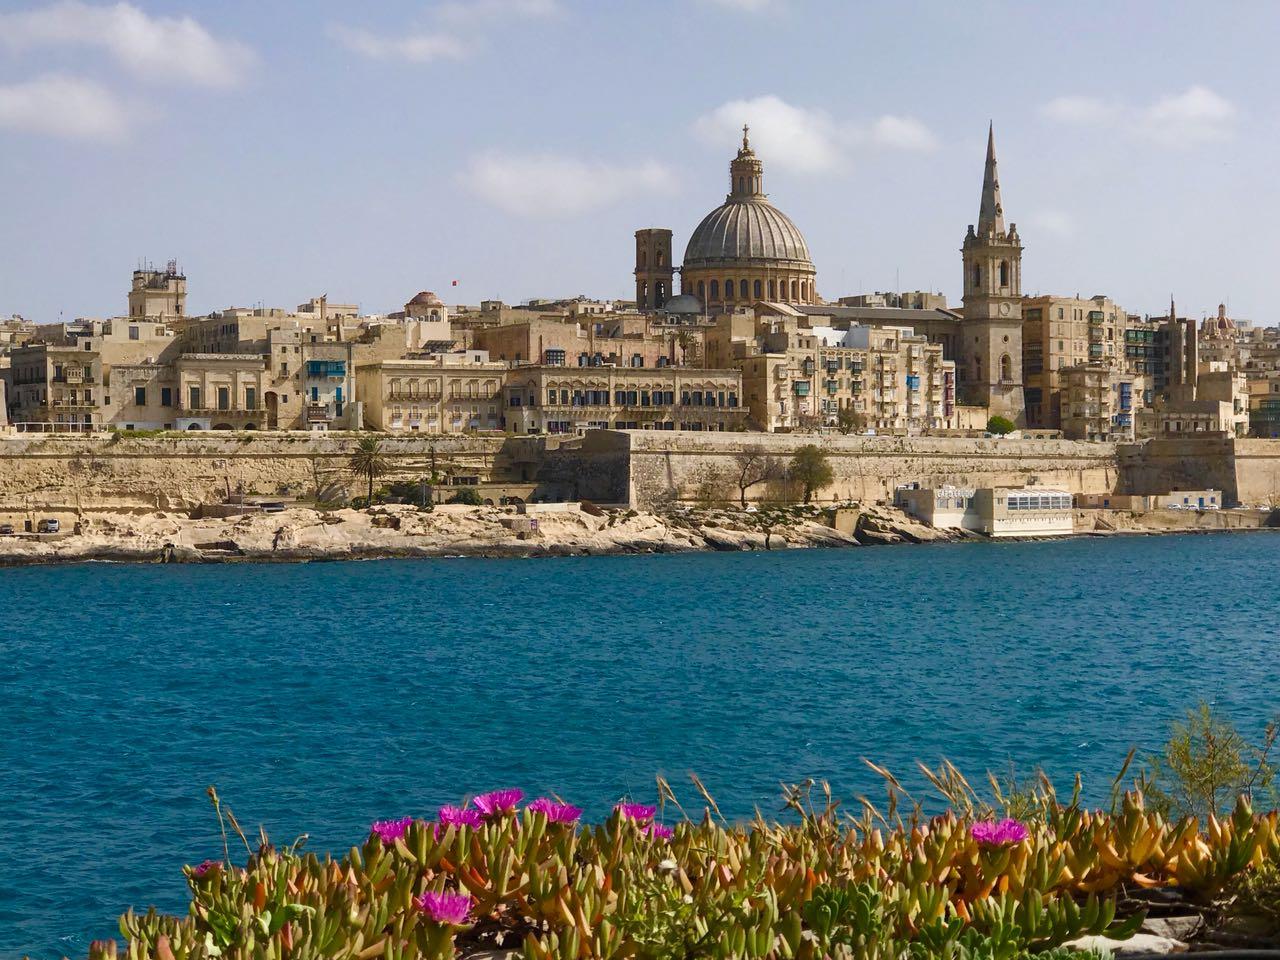 Rozhovor o Malte - Valletta